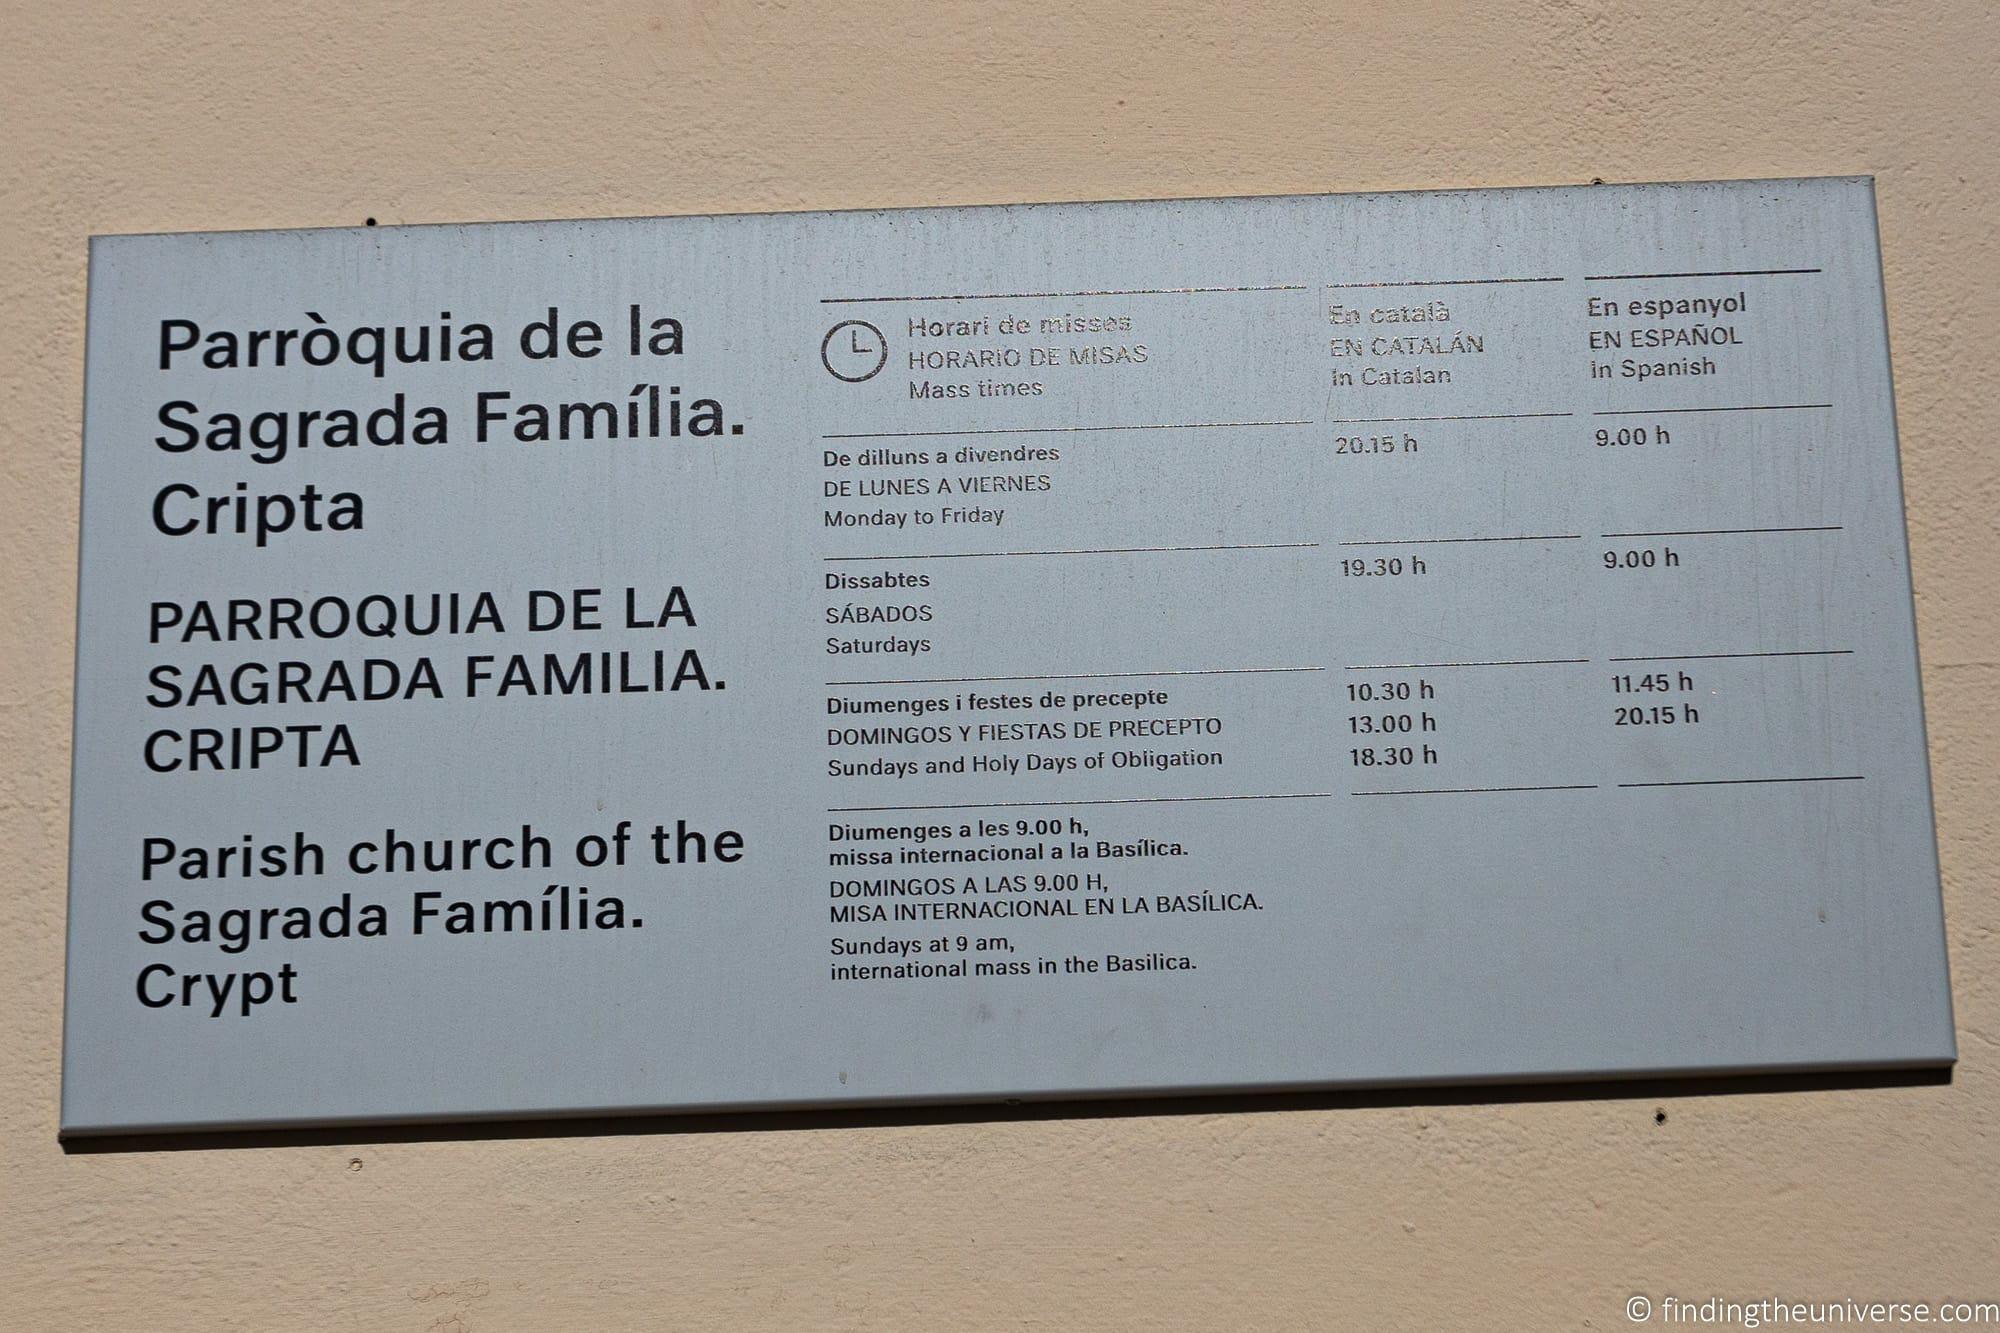 Sagrada Familia Crypt hours